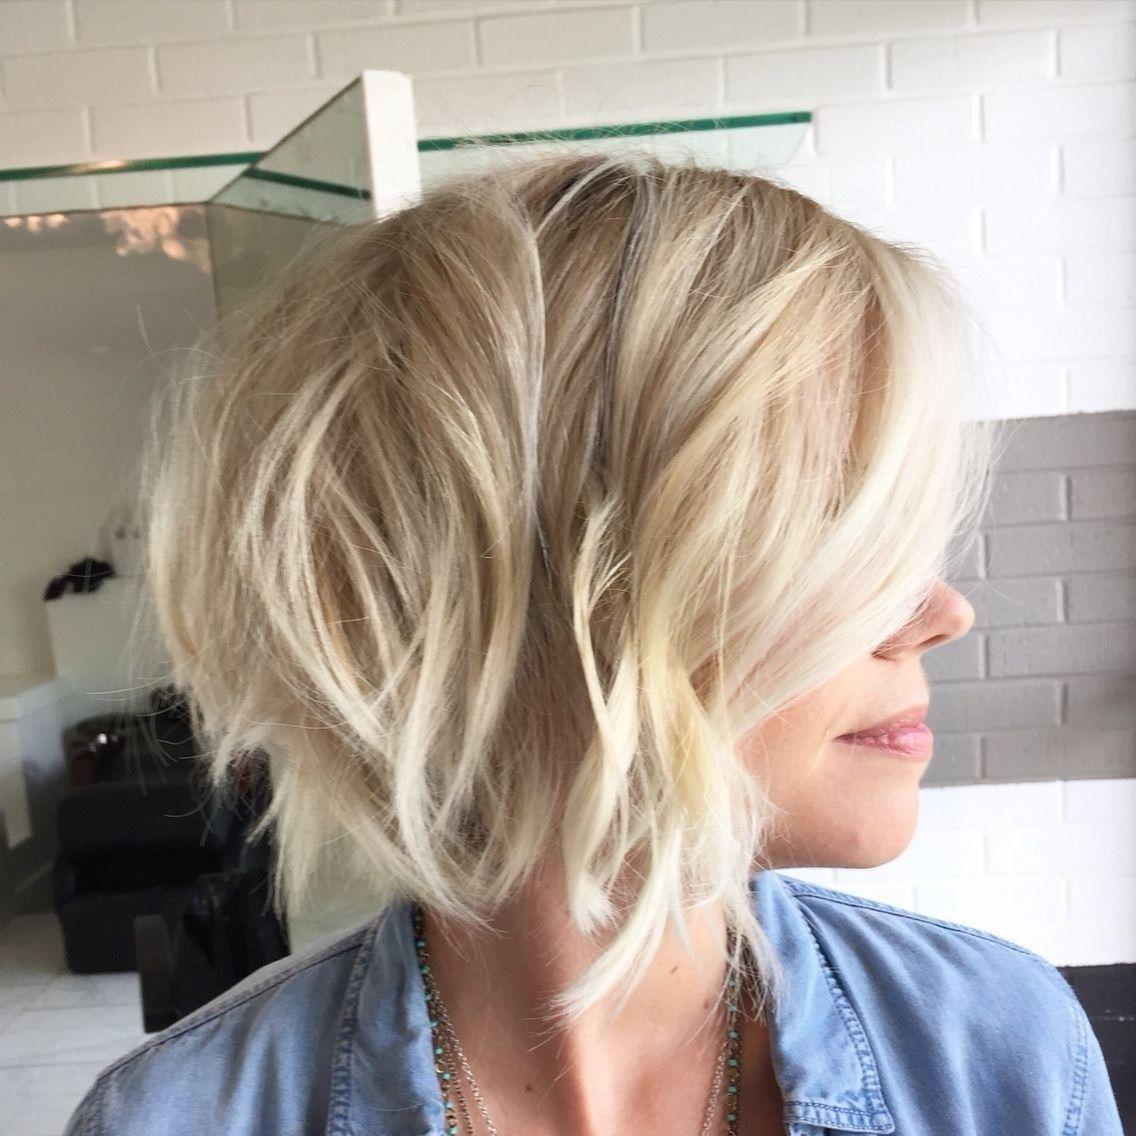 Cute bob hairstyles easy maintenance for yearst bob pinterest